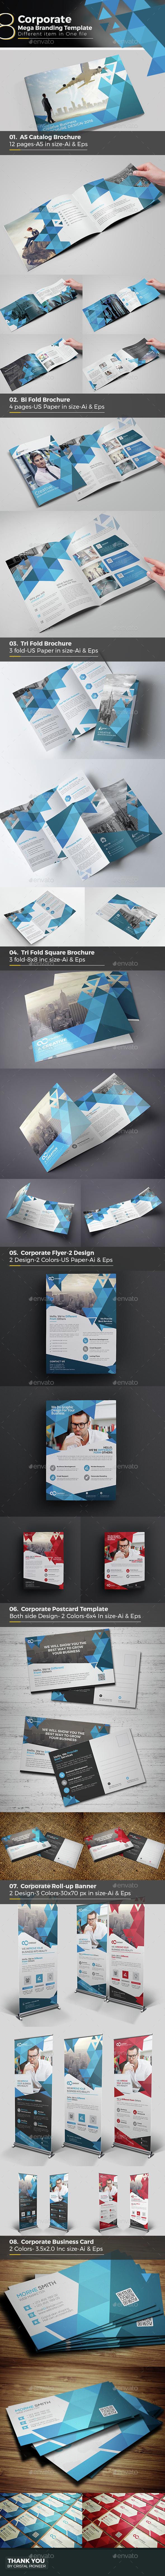 Corporate Mega Branding Bundle Template - Corporate Brochures